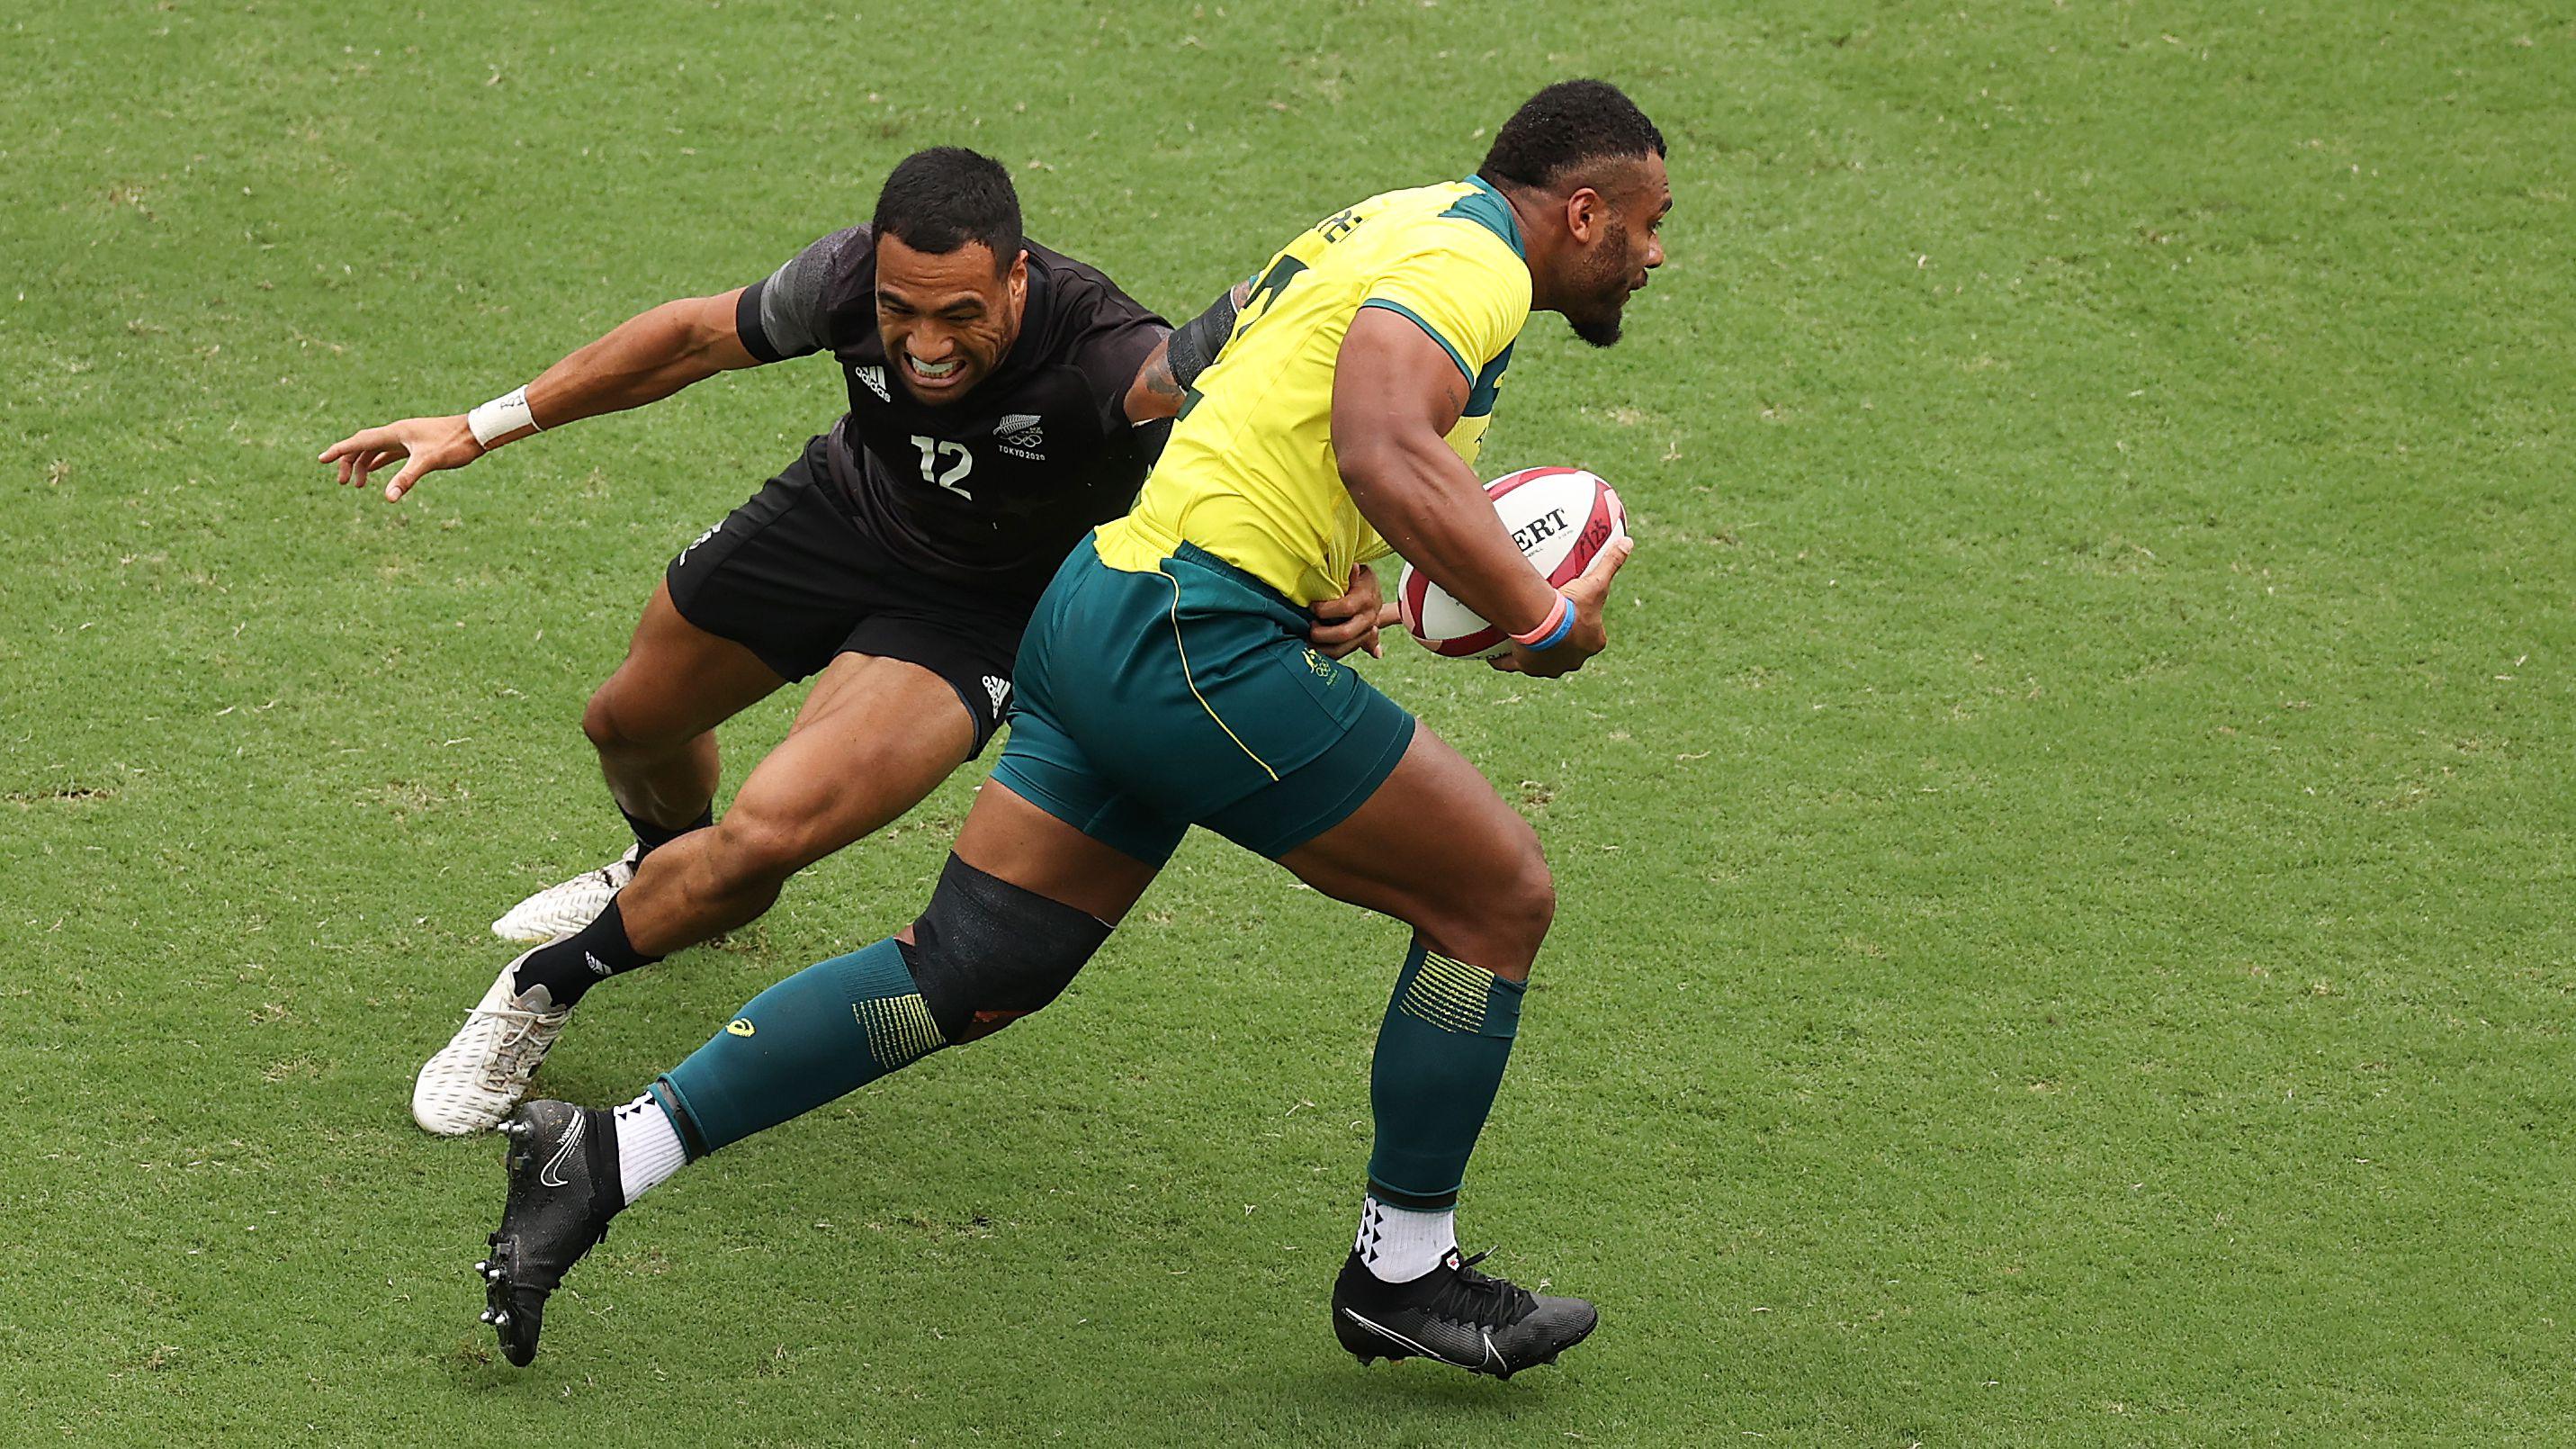 Aussies blow golden opportunity against Kiwis